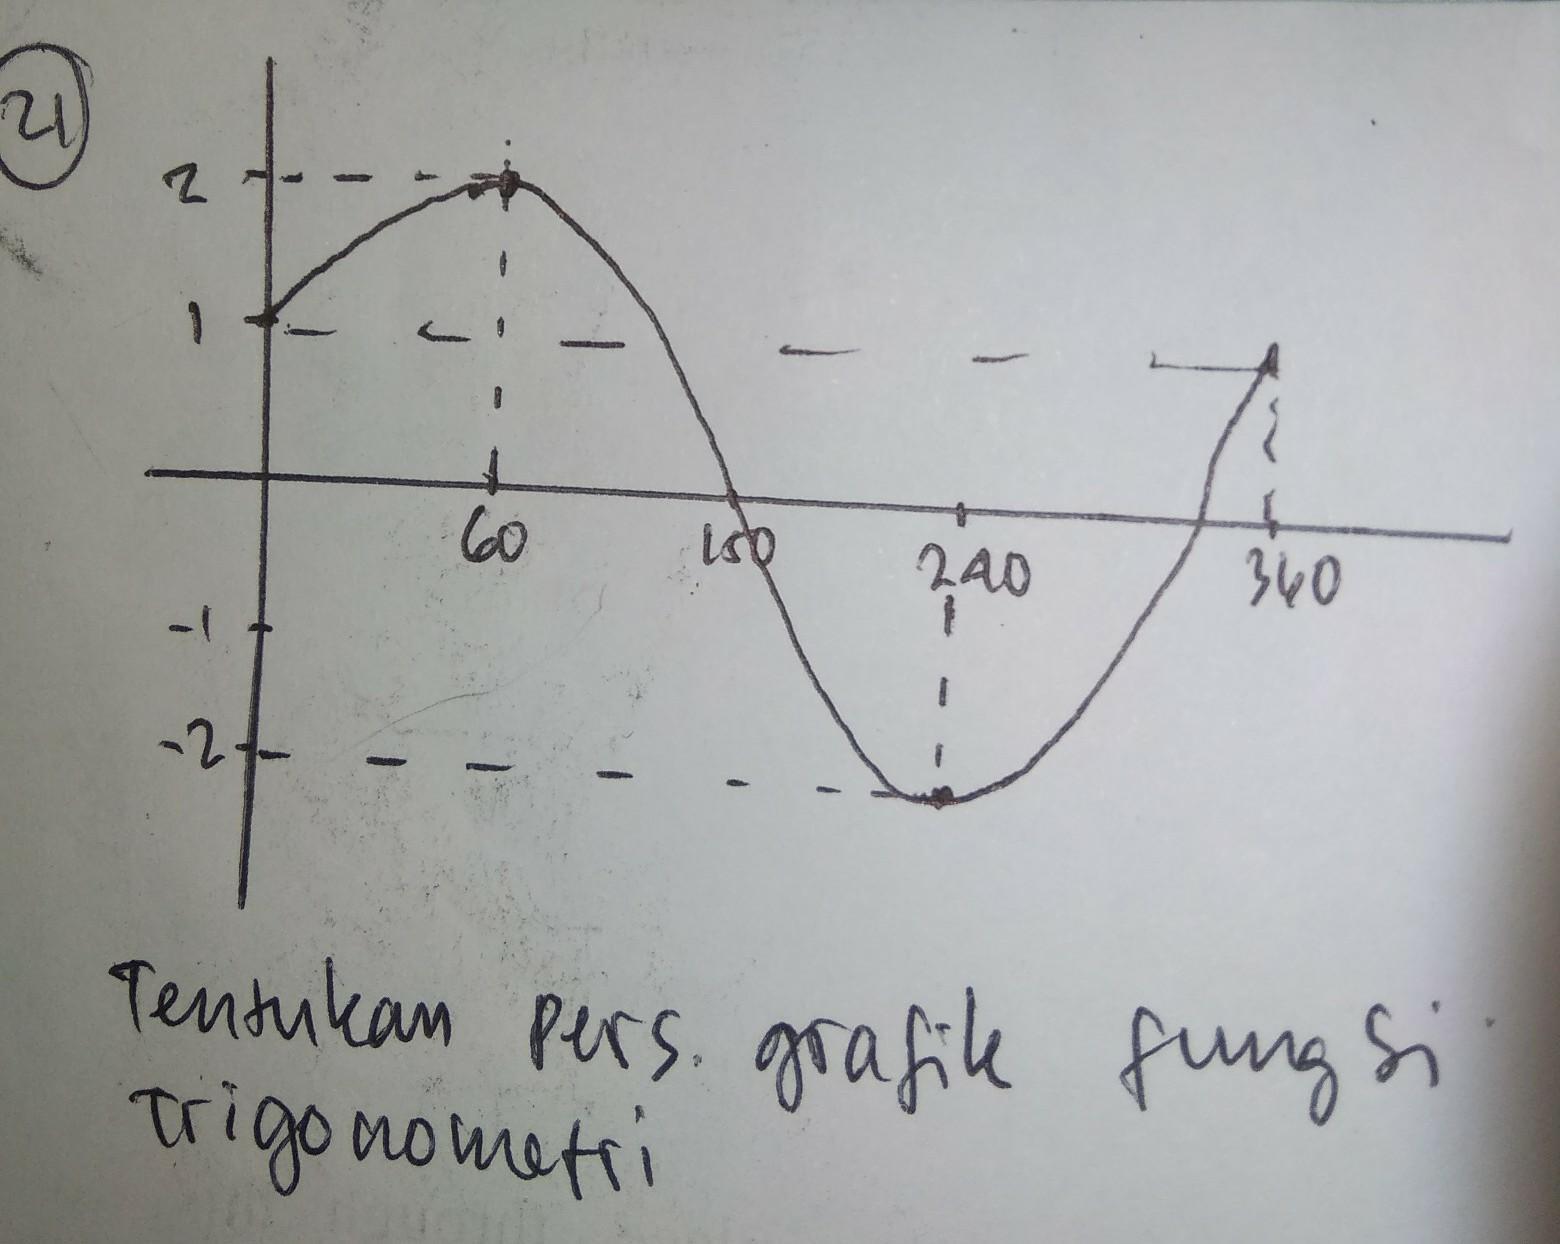 Tentukan Persamaan Grafik Fungsi Trigonometri Berikut Gambar